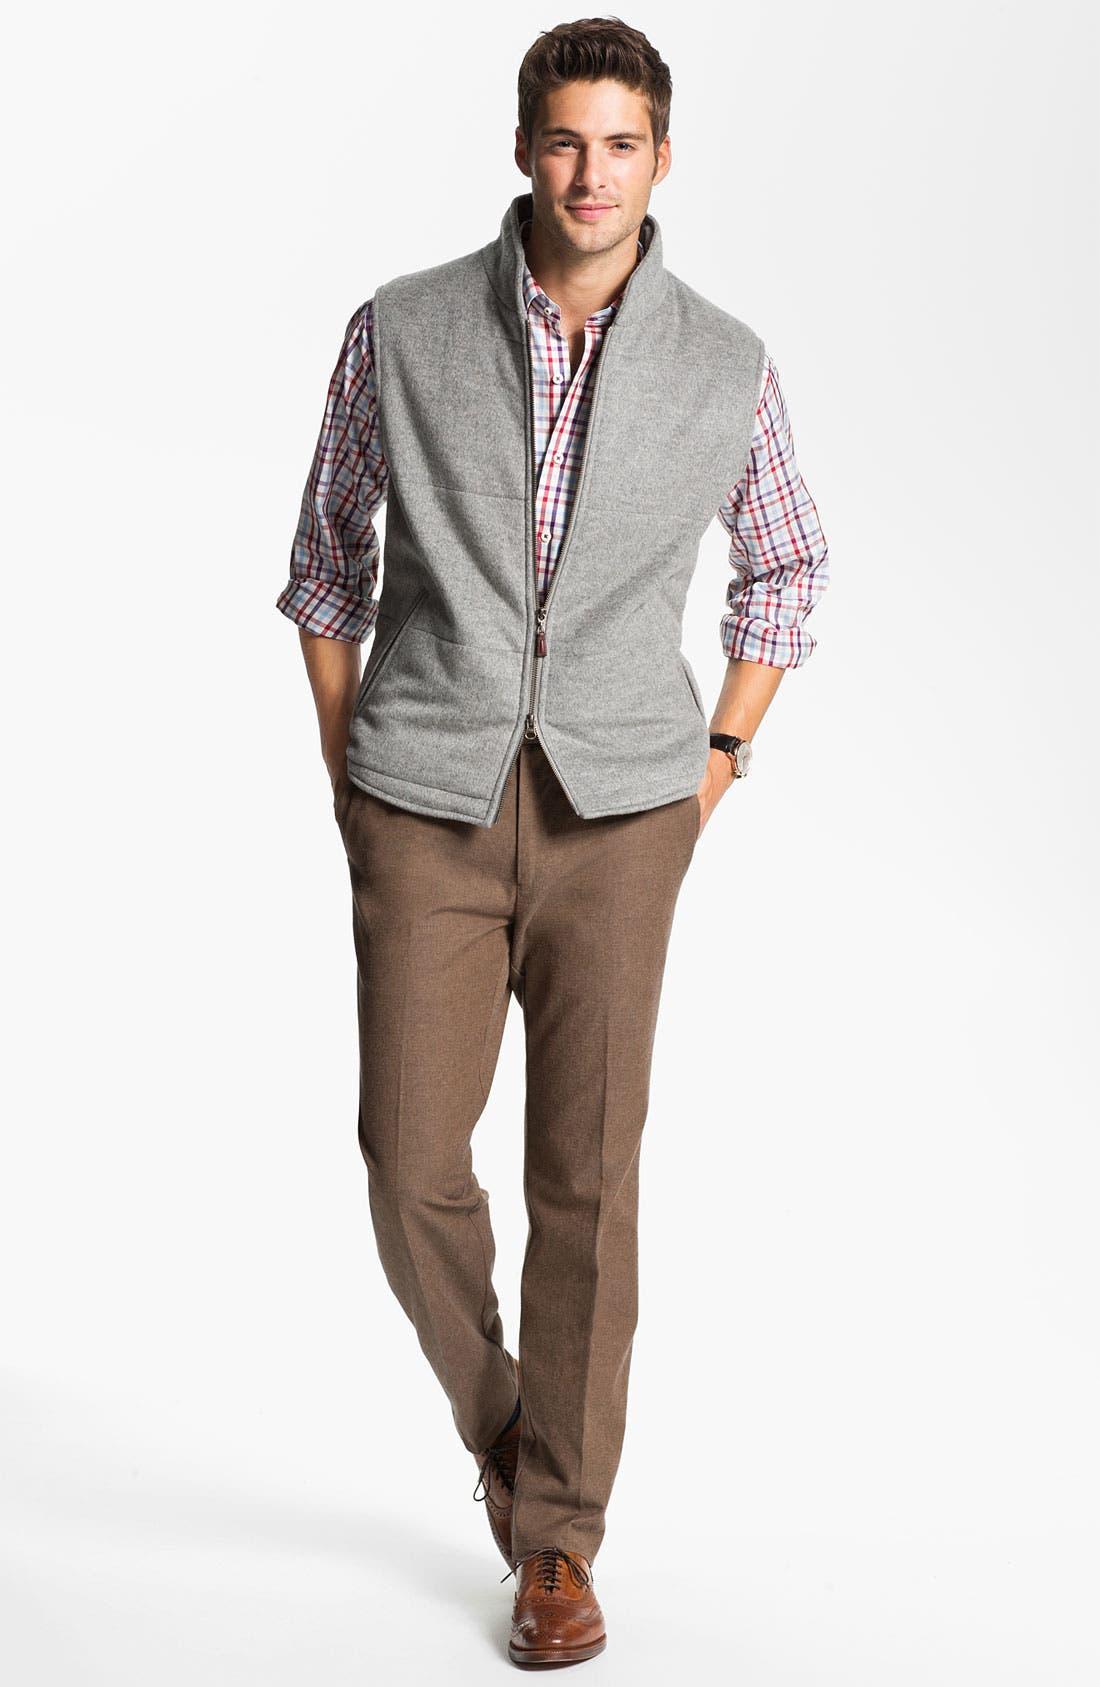 Main Image - Peter Millar Vest, Sport Shirt & Trousers